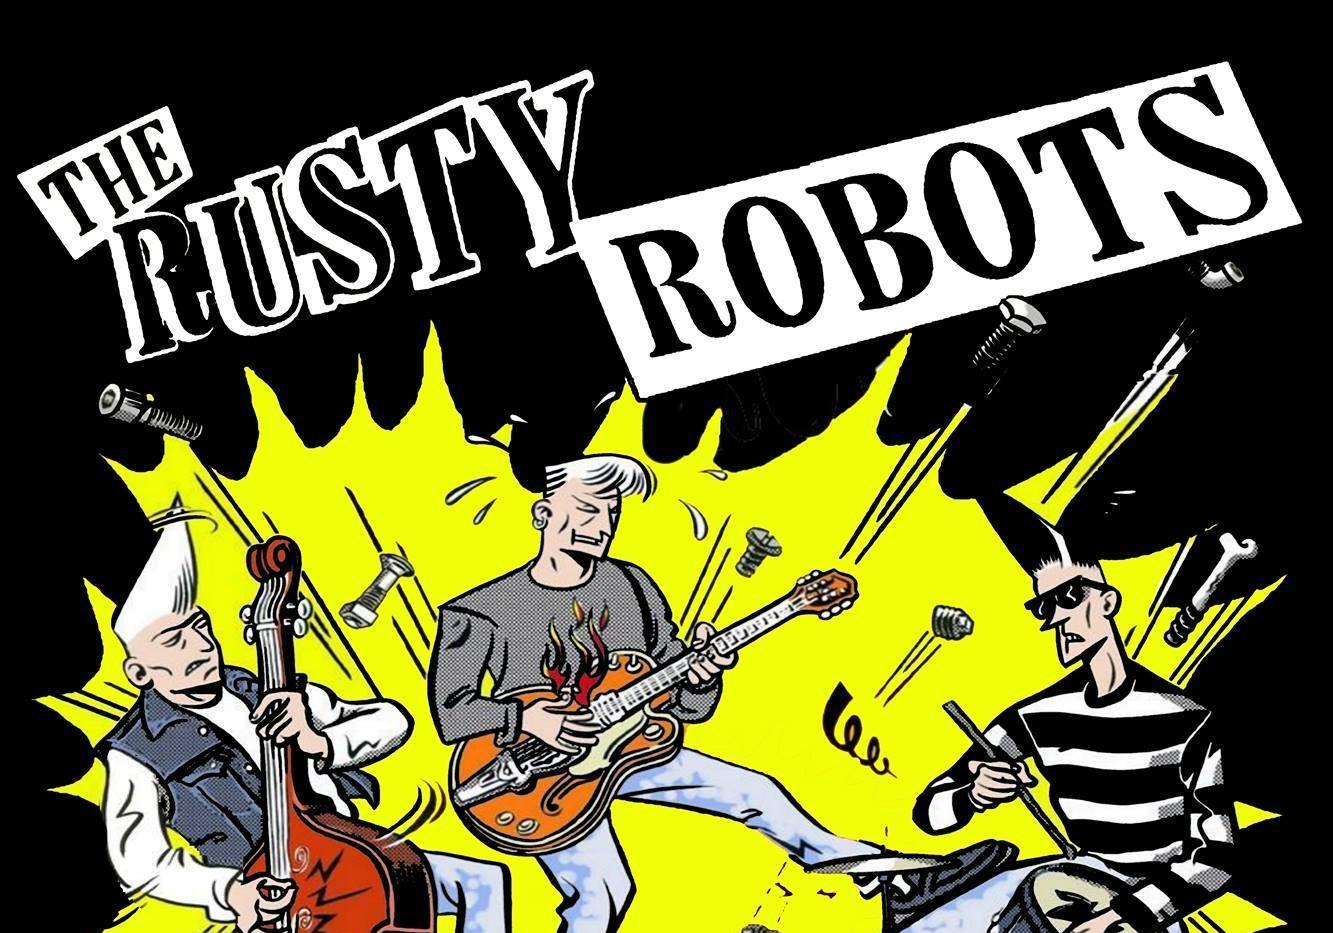 Rusty Robots (2).jpg